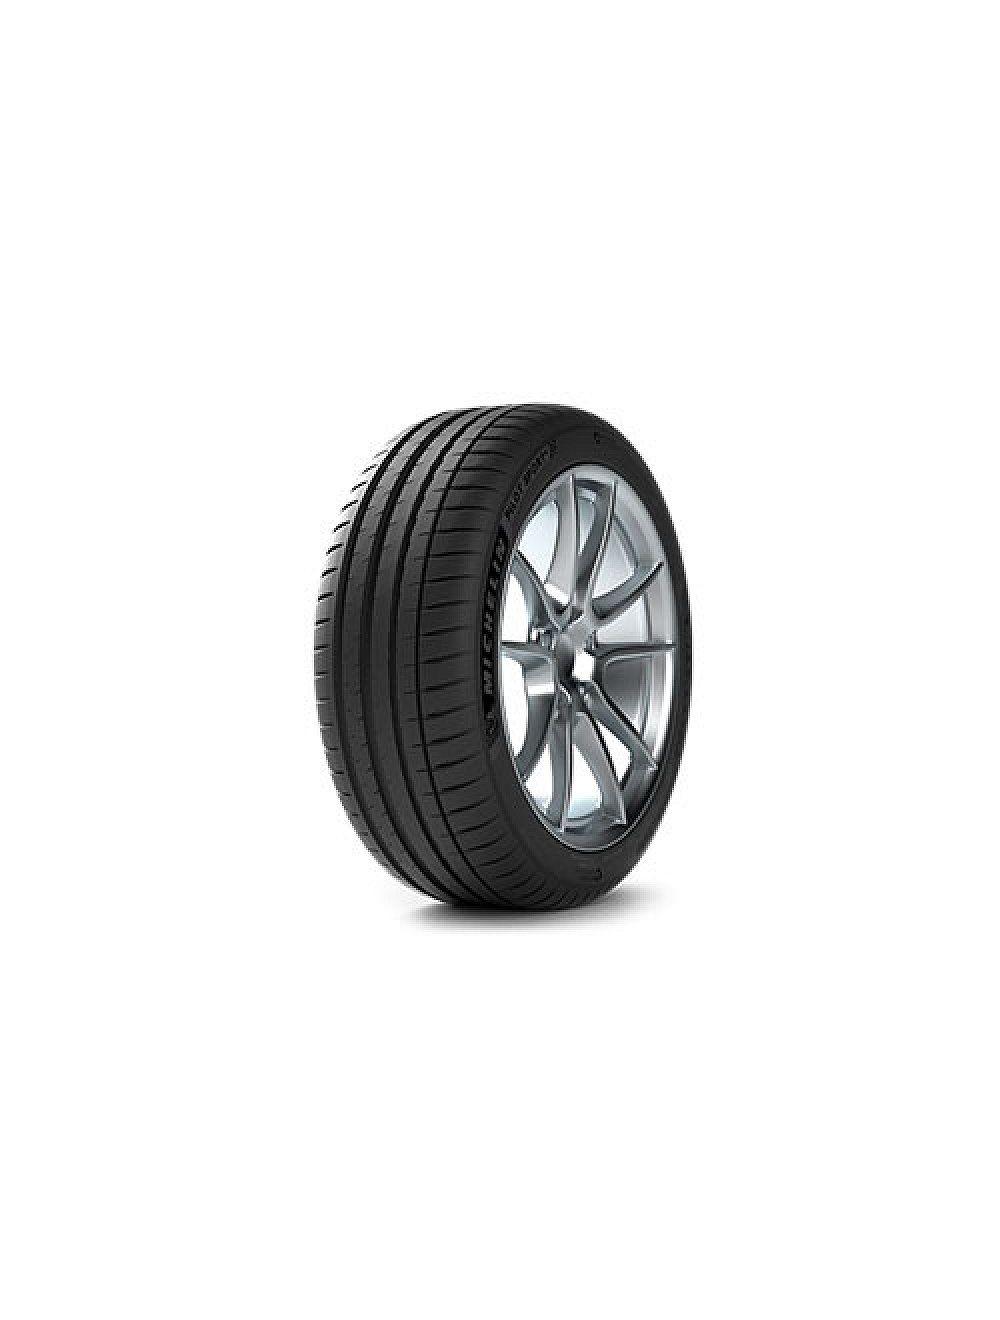 Michelin 255/30R19 Y Pilot Sport4 S XL ZP Nyári gumi